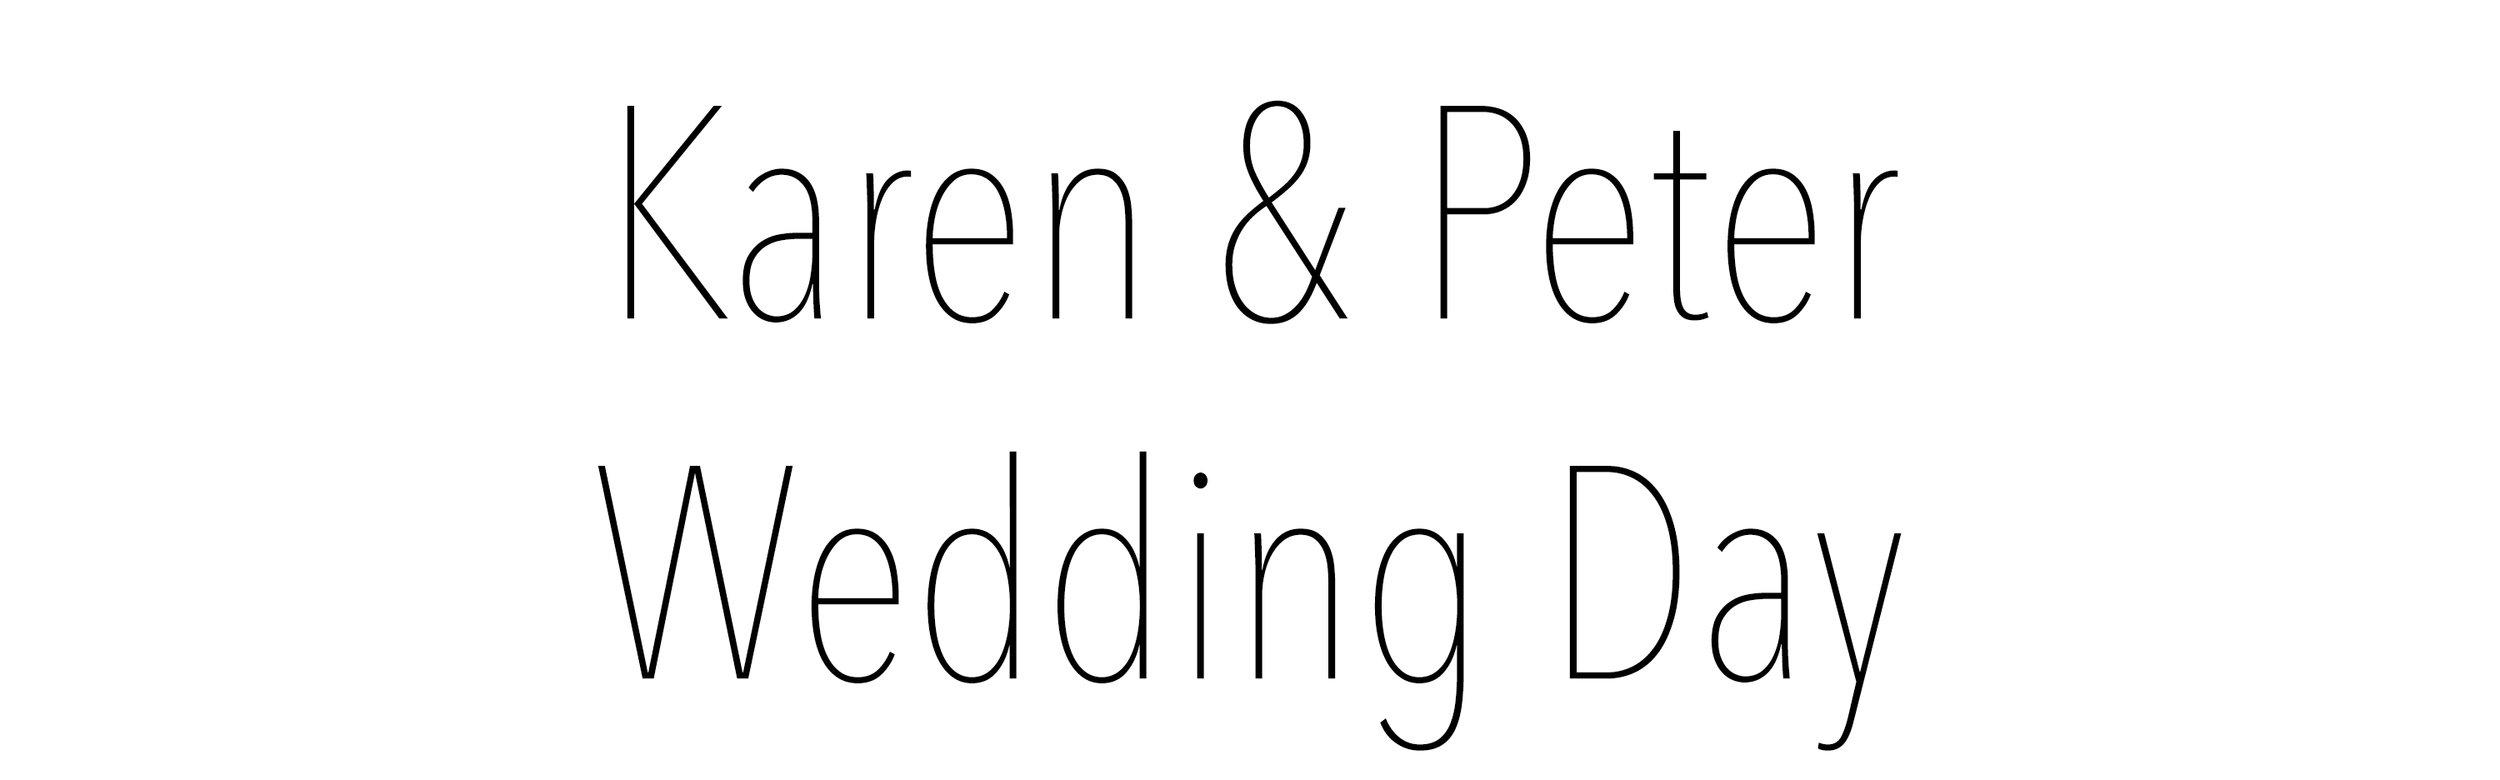 Karen&Peter_Wedding_Day.jpg